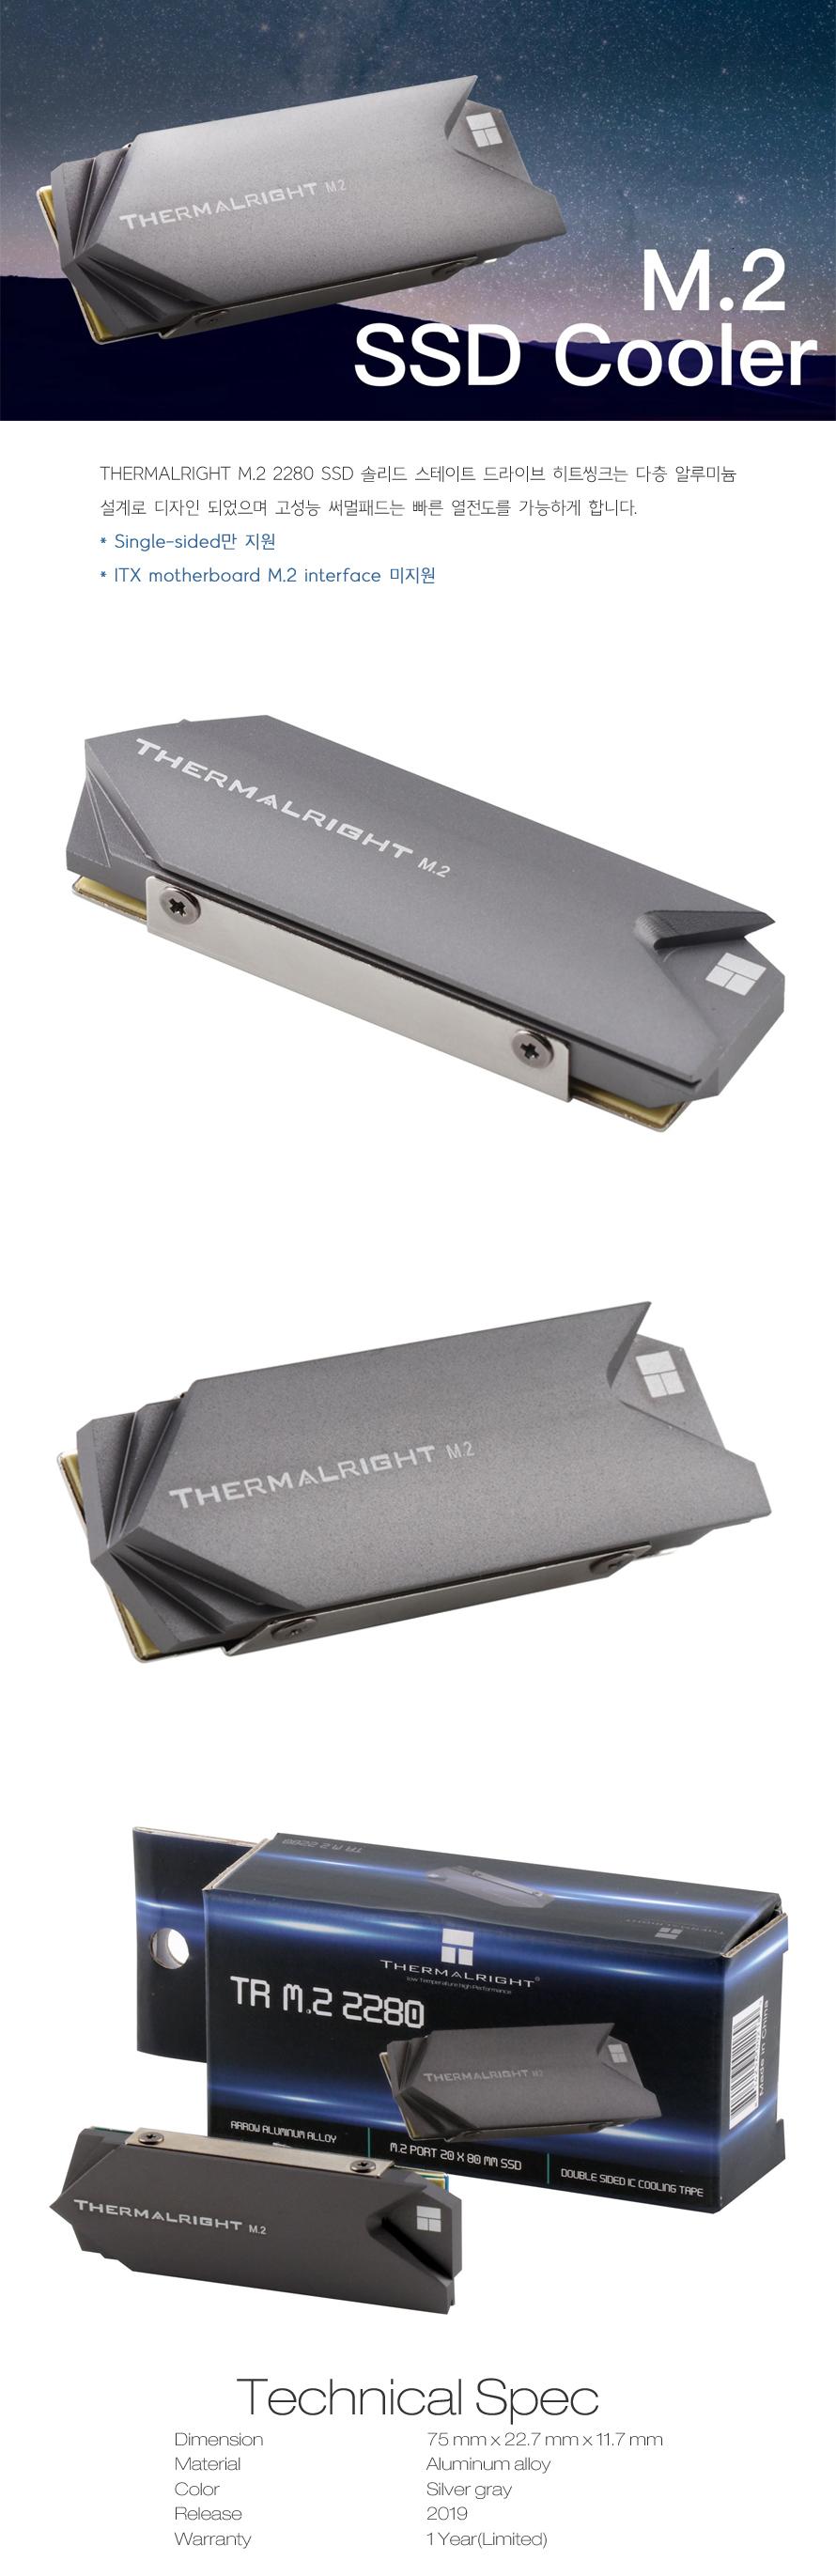 Thermalright M.2 2280 HEATSINK